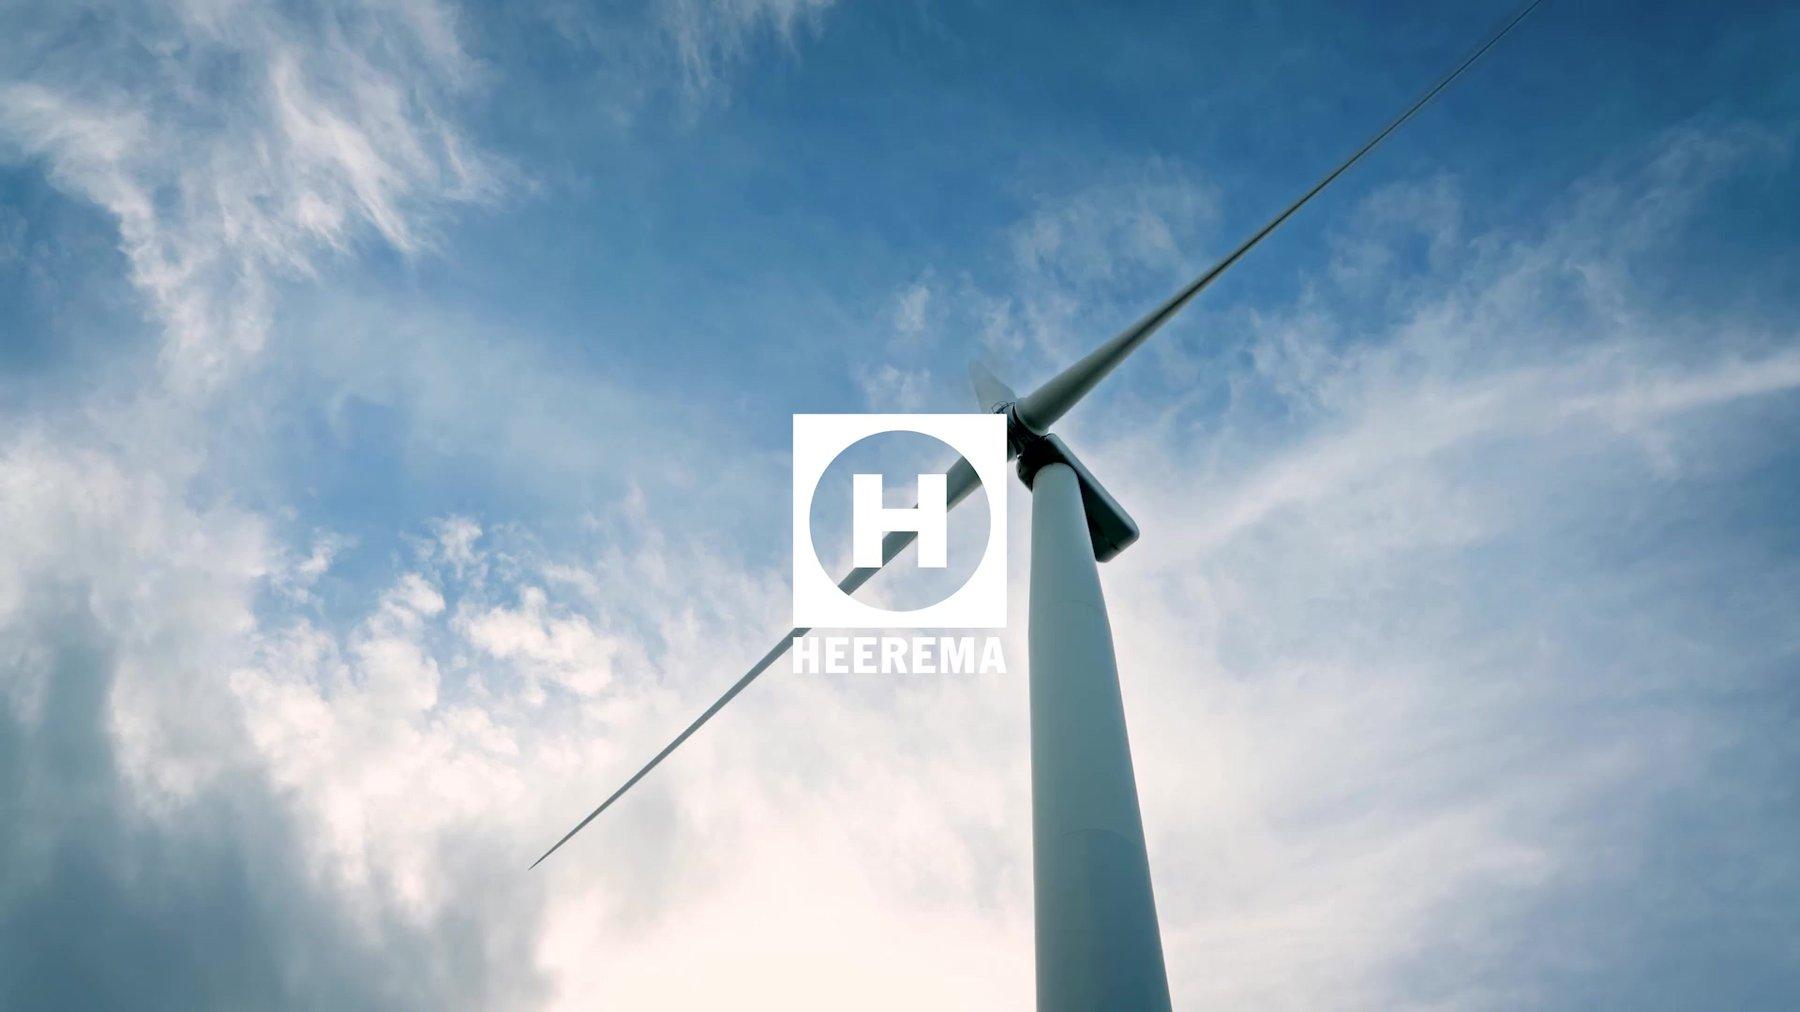 Heerema Homepage_Final-thumb